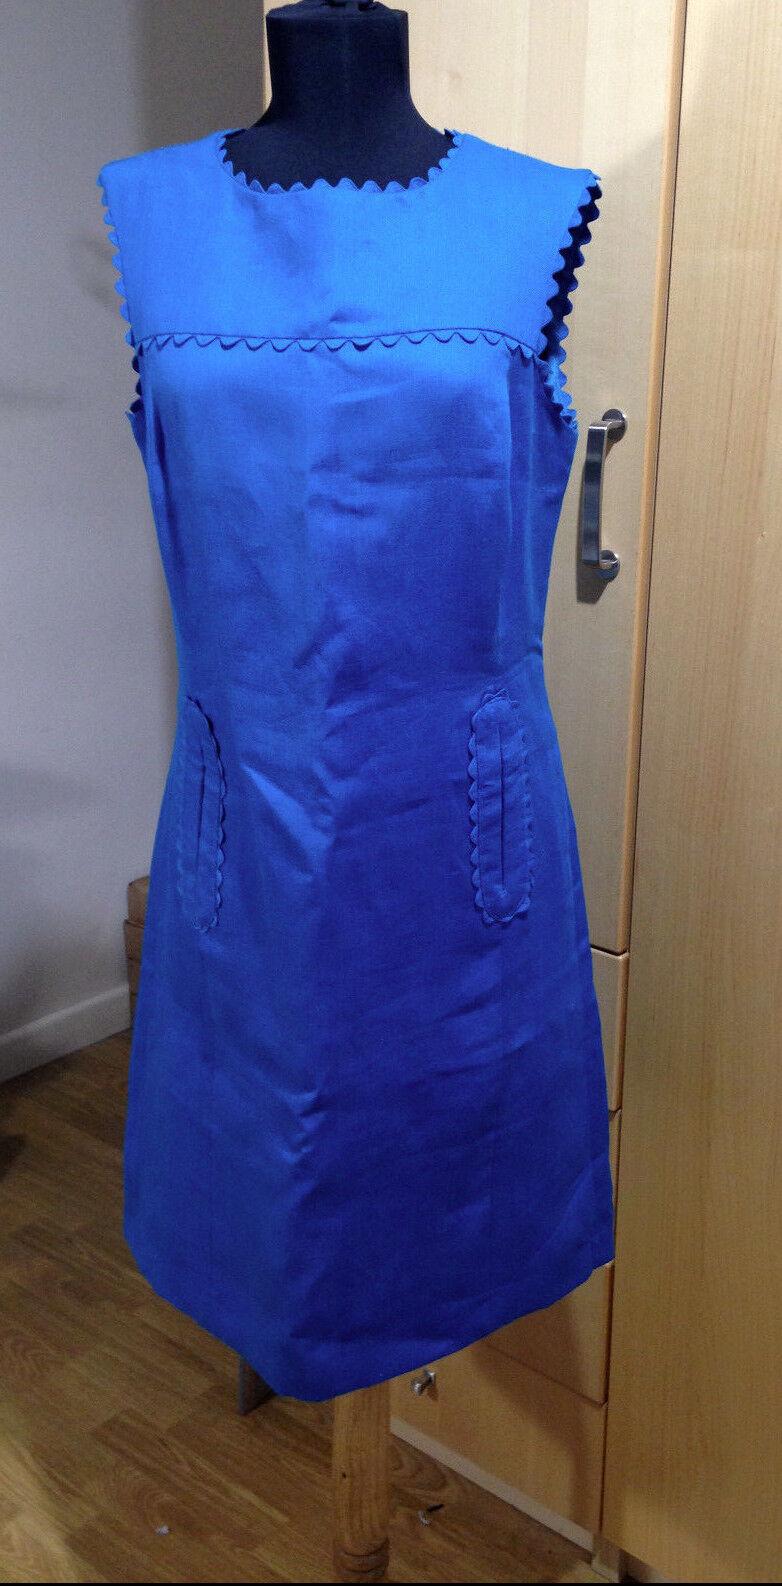 Hobbs Deep Teal Flax Shift Dress - Size 12 BNWT